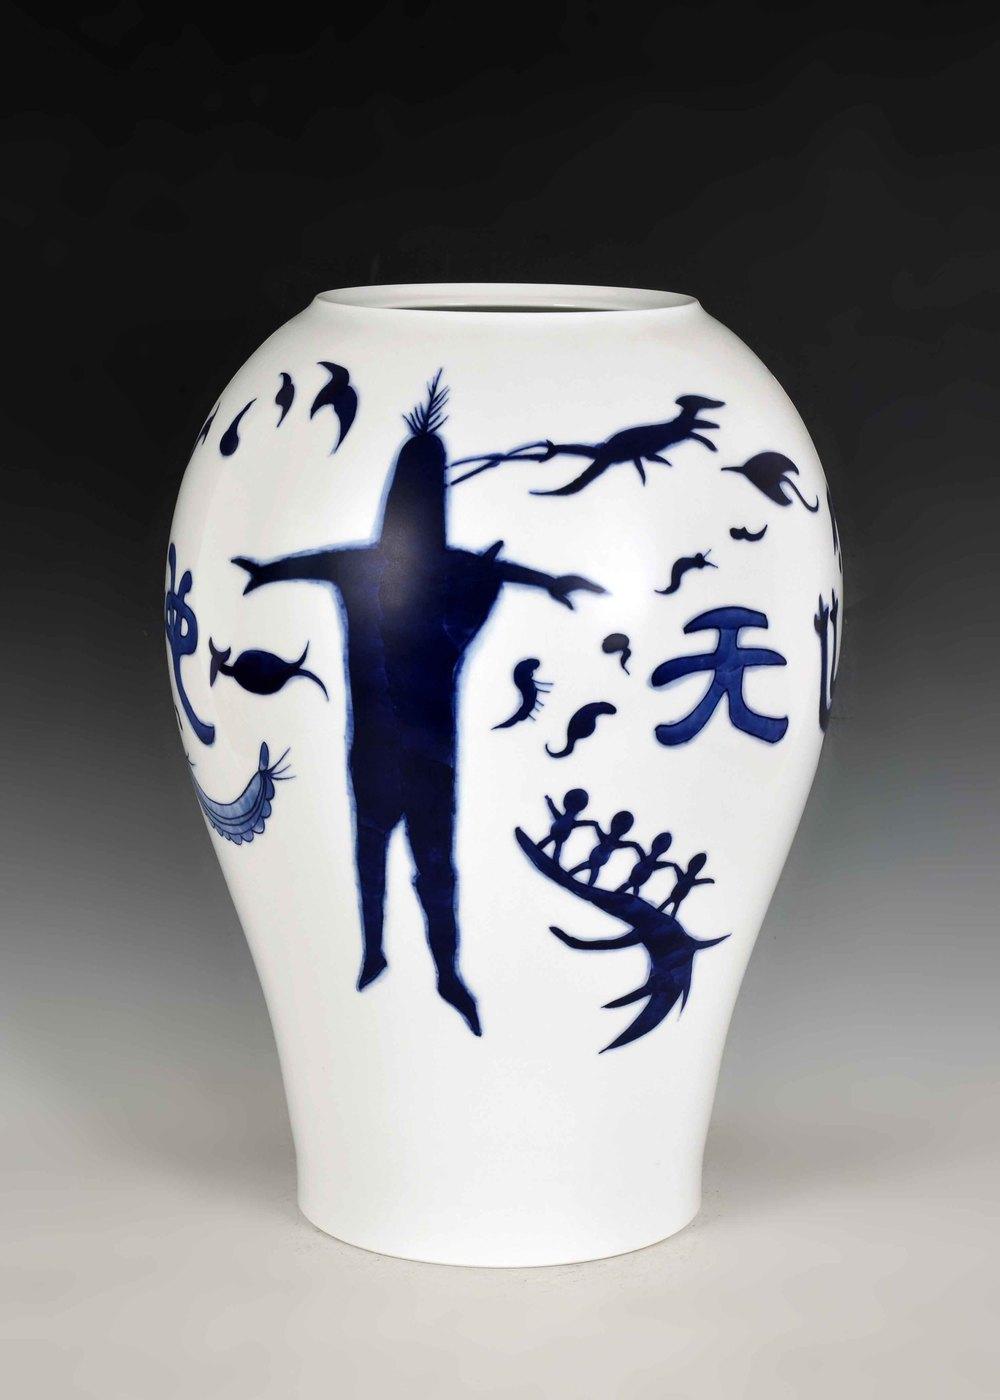 GUAN WEI    Land of the Dreaming No.9    2014   41 x 30 cm   Ceramic